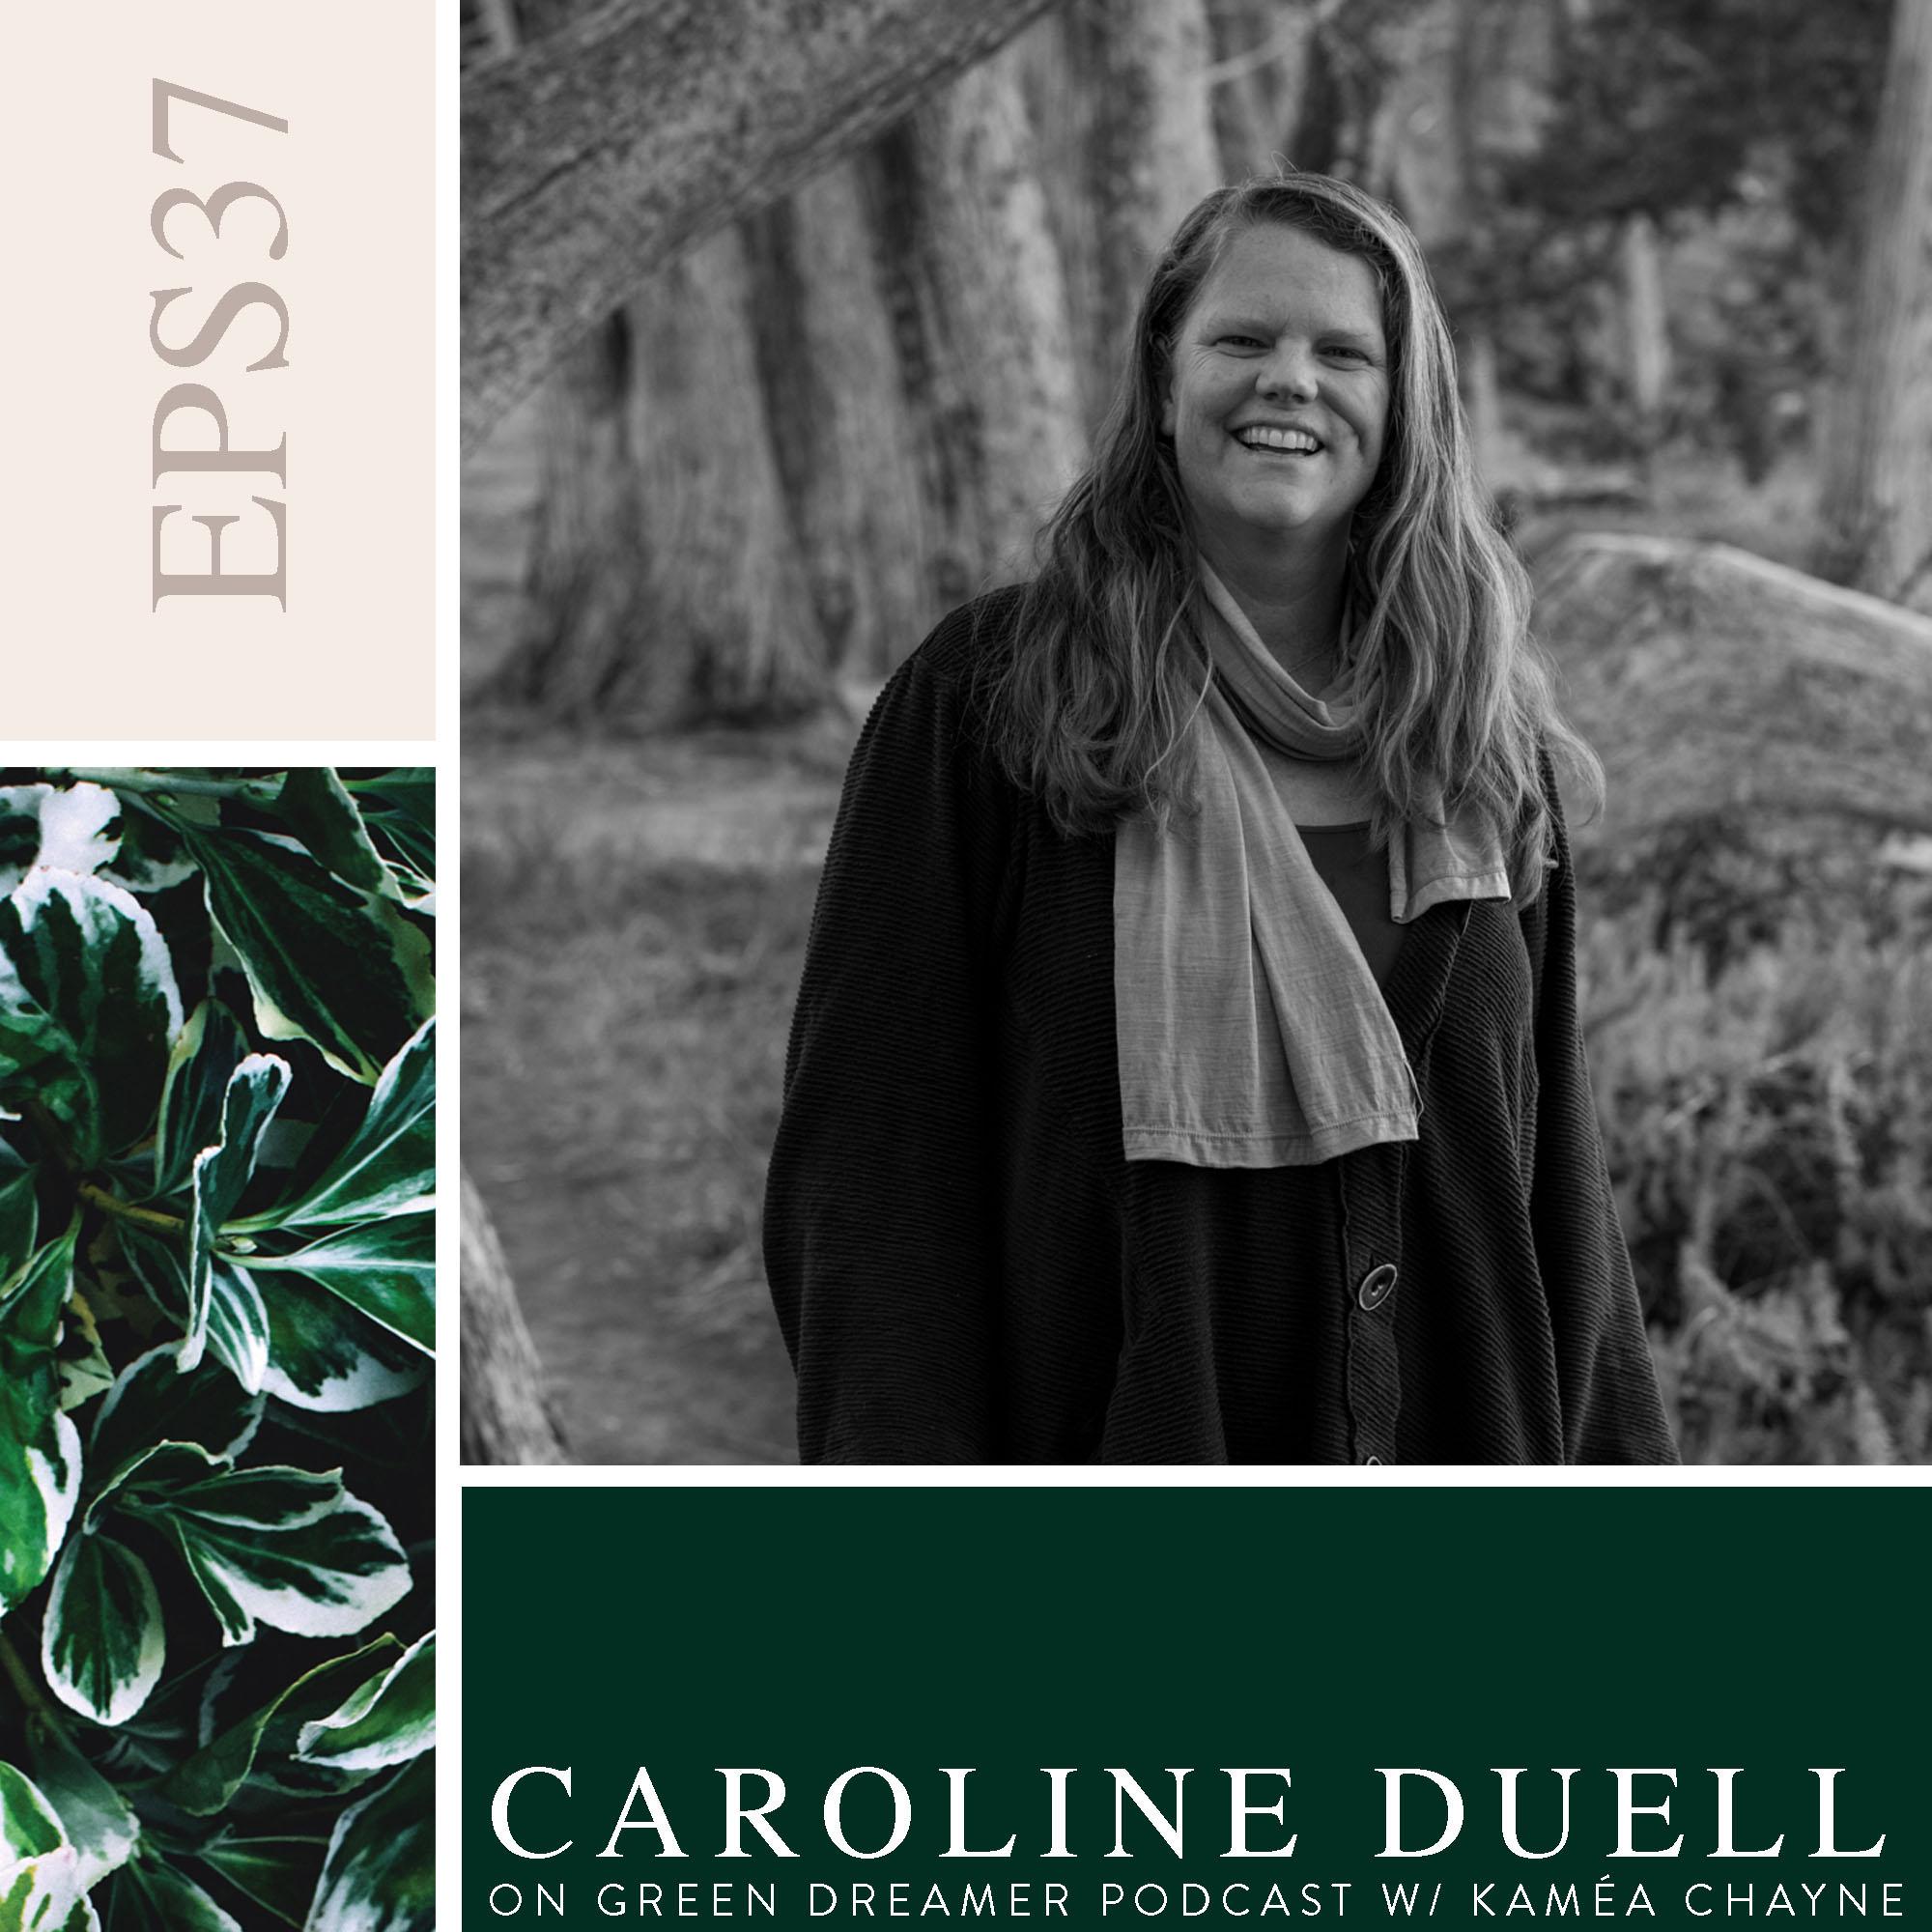 37) BW Caroline-Duell-Safe-SUnscreen-Council-All-Good-on-Green-Dreamer-Podcast-with-Kaméa-Chayne.jpg